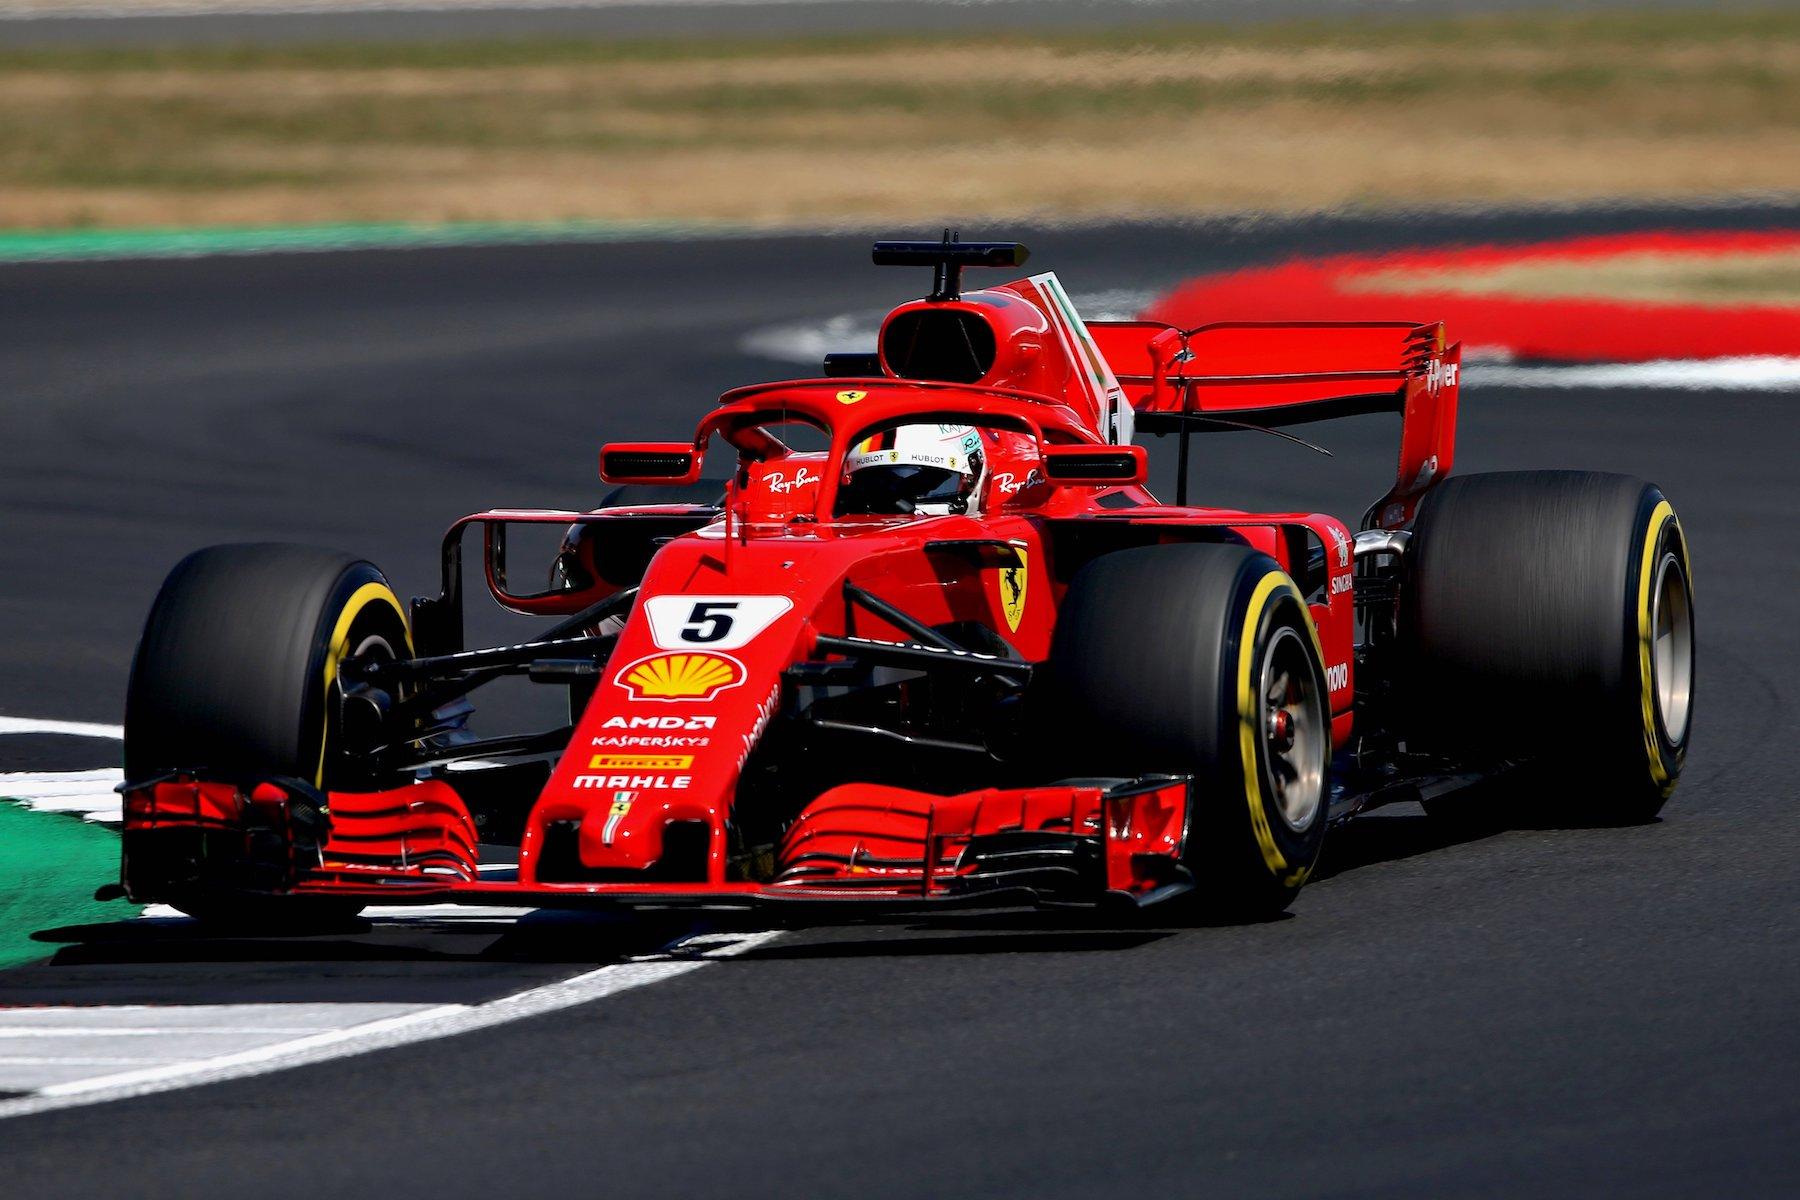 H 2018 Sebastian Vettel | Ferrari SF71H | 2018 British GP winner 1 copy.jpg